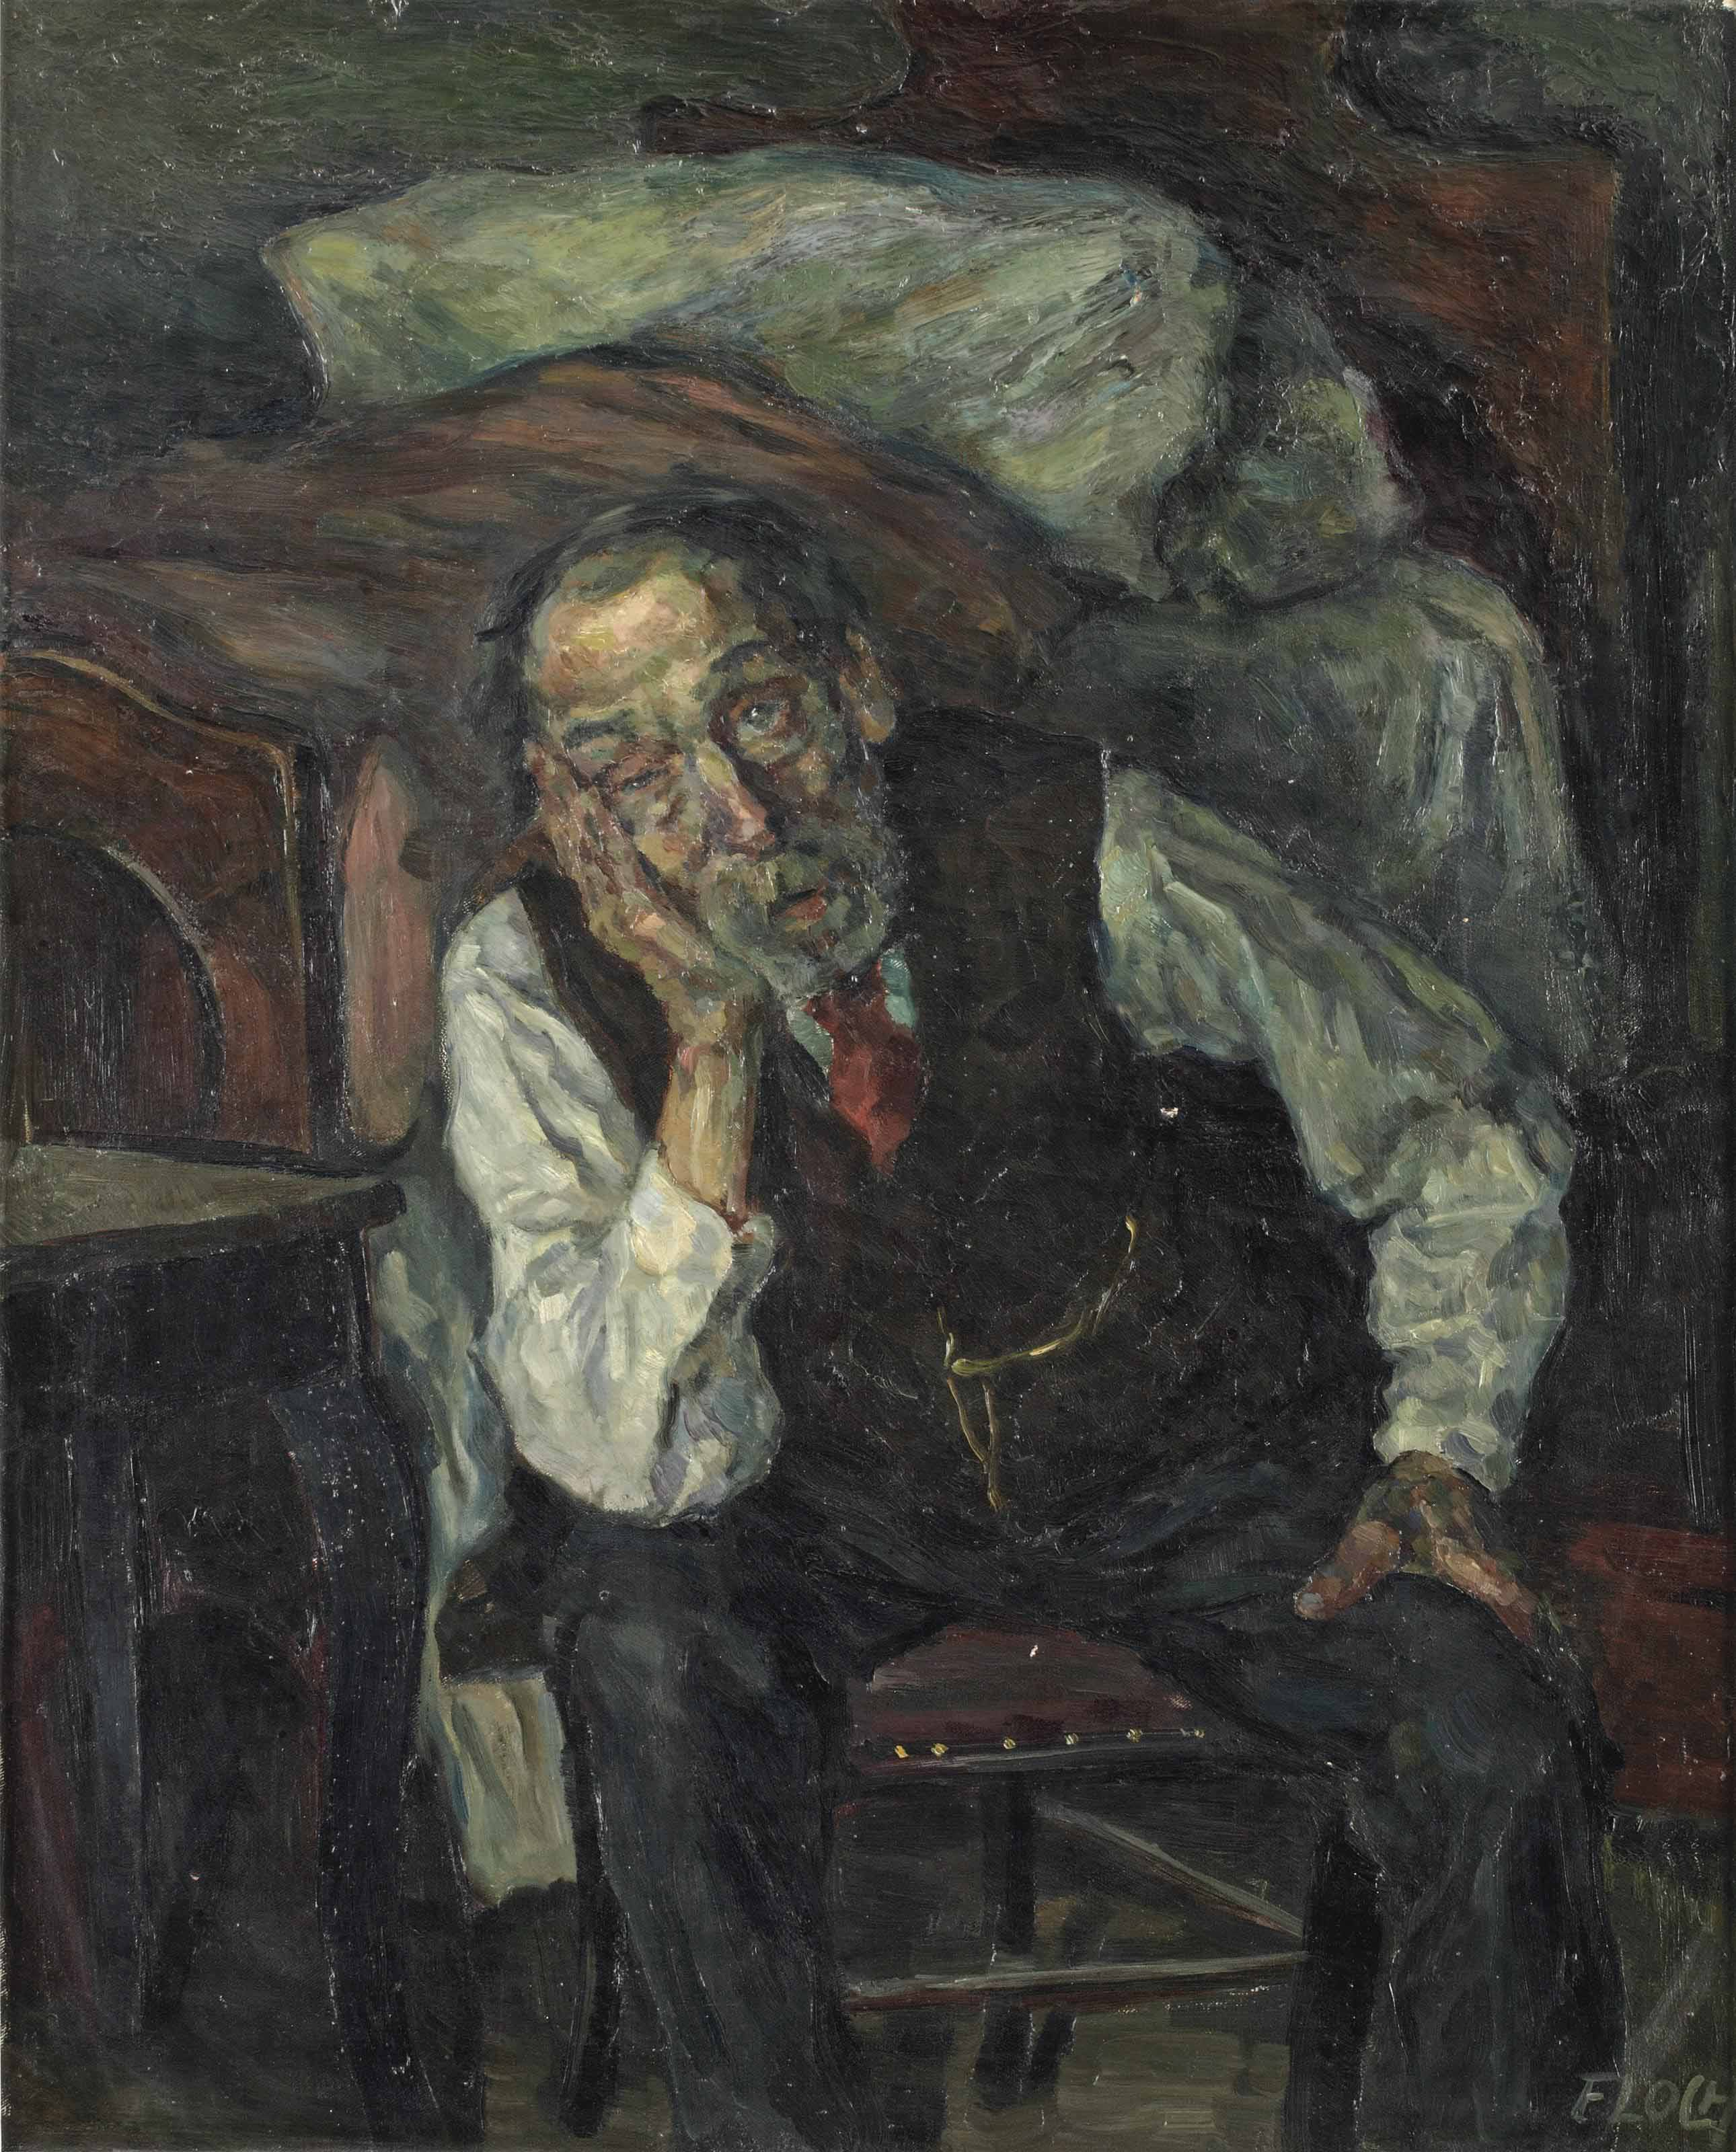 Portrait of an older men